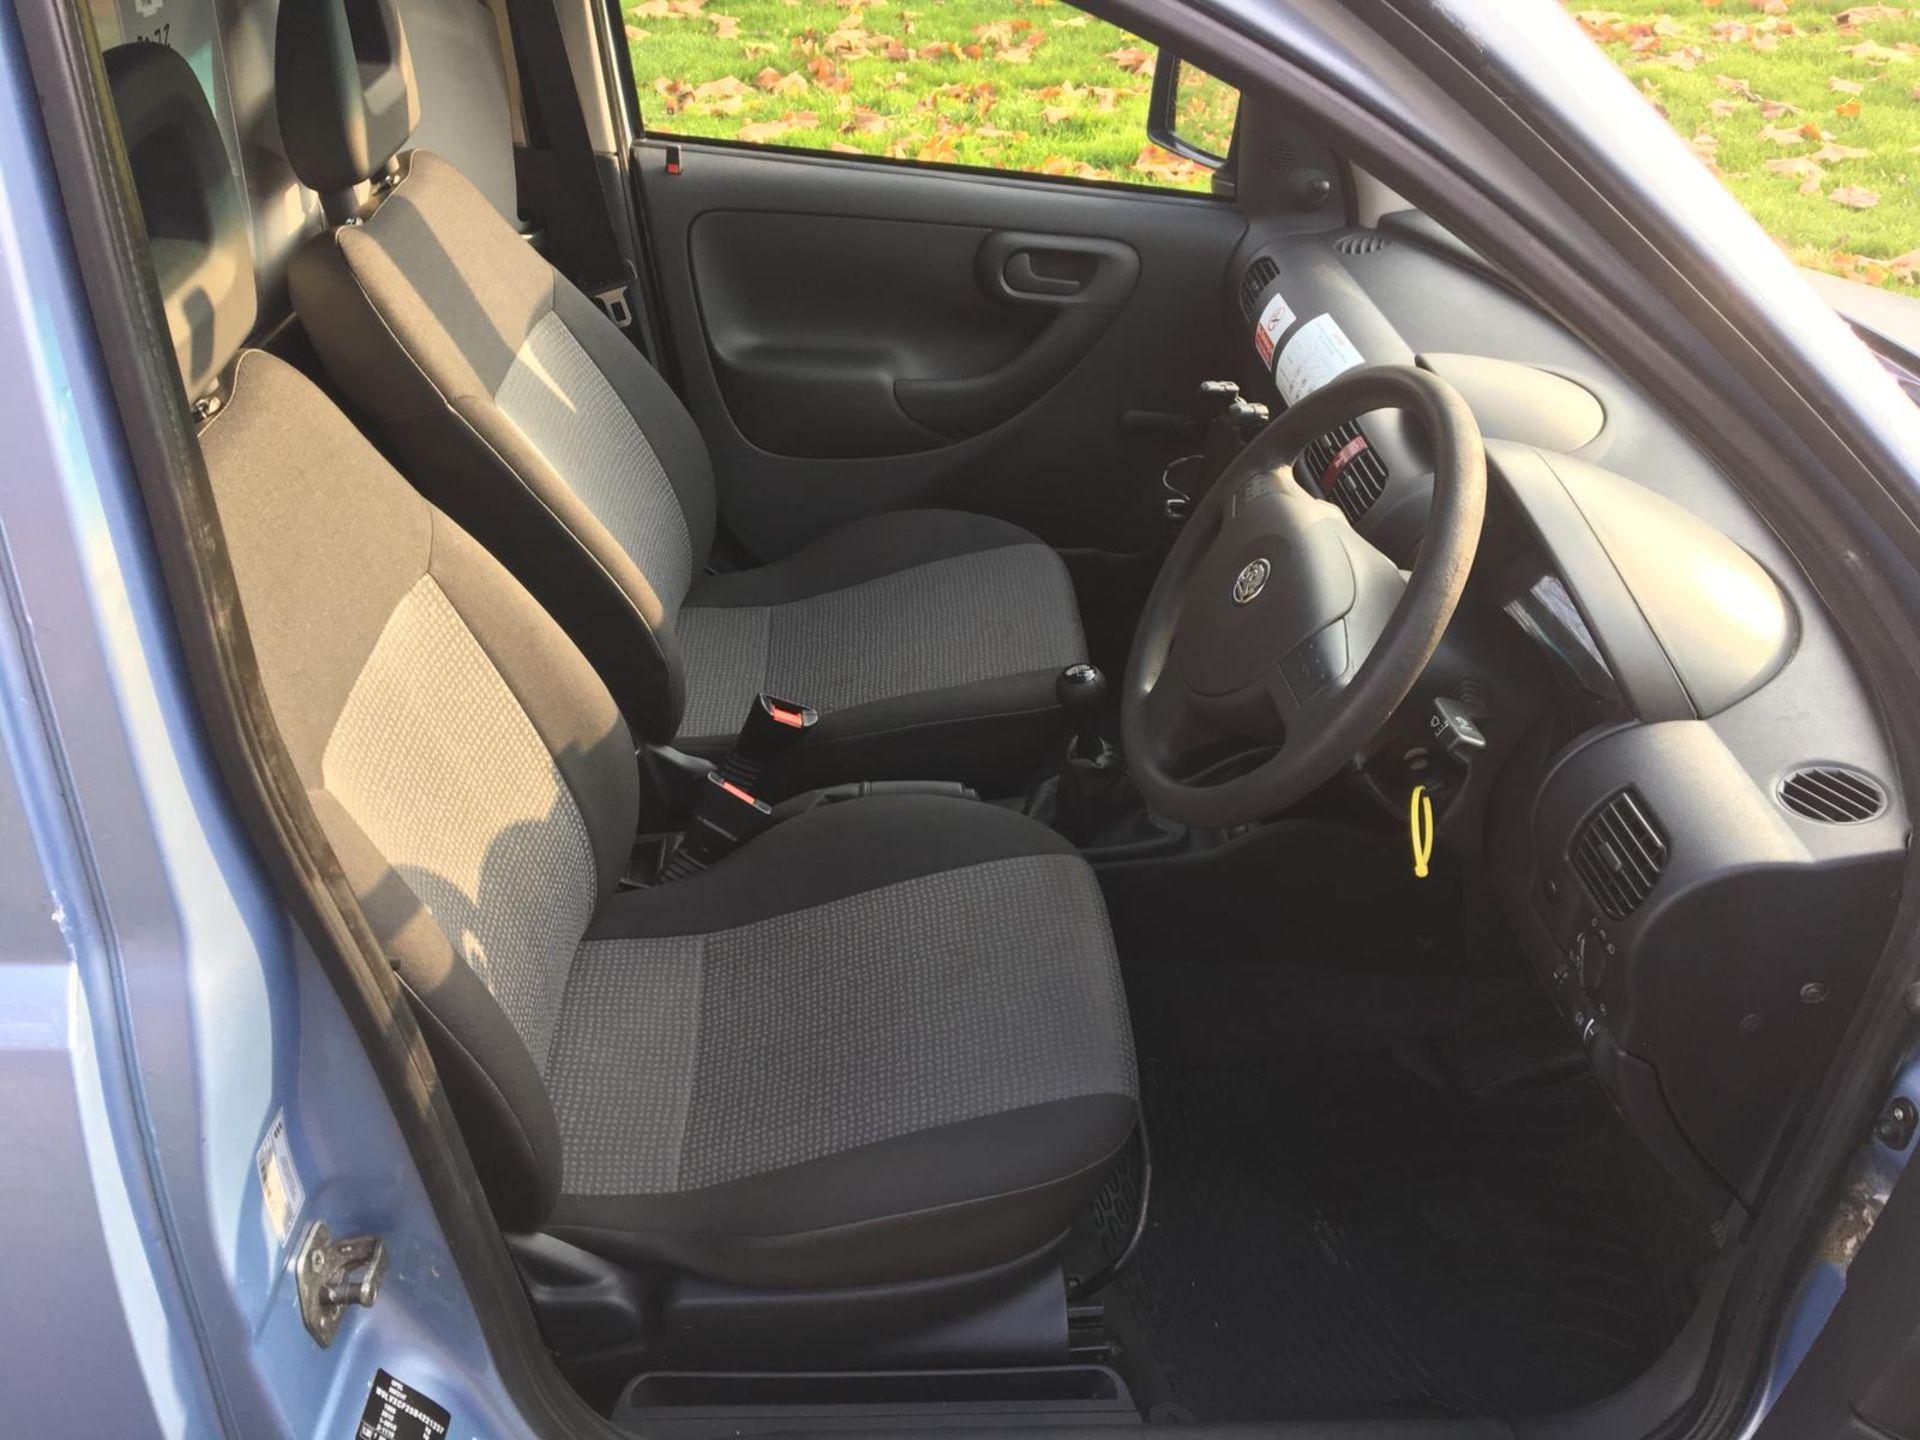 Lot 64 - 2011/11 REG VAUXHALL COMBO 2000 CDTI 16V BLUE DIESEL CAR DERIVED VAN, SHOWING 0 FORMER KEEPERS